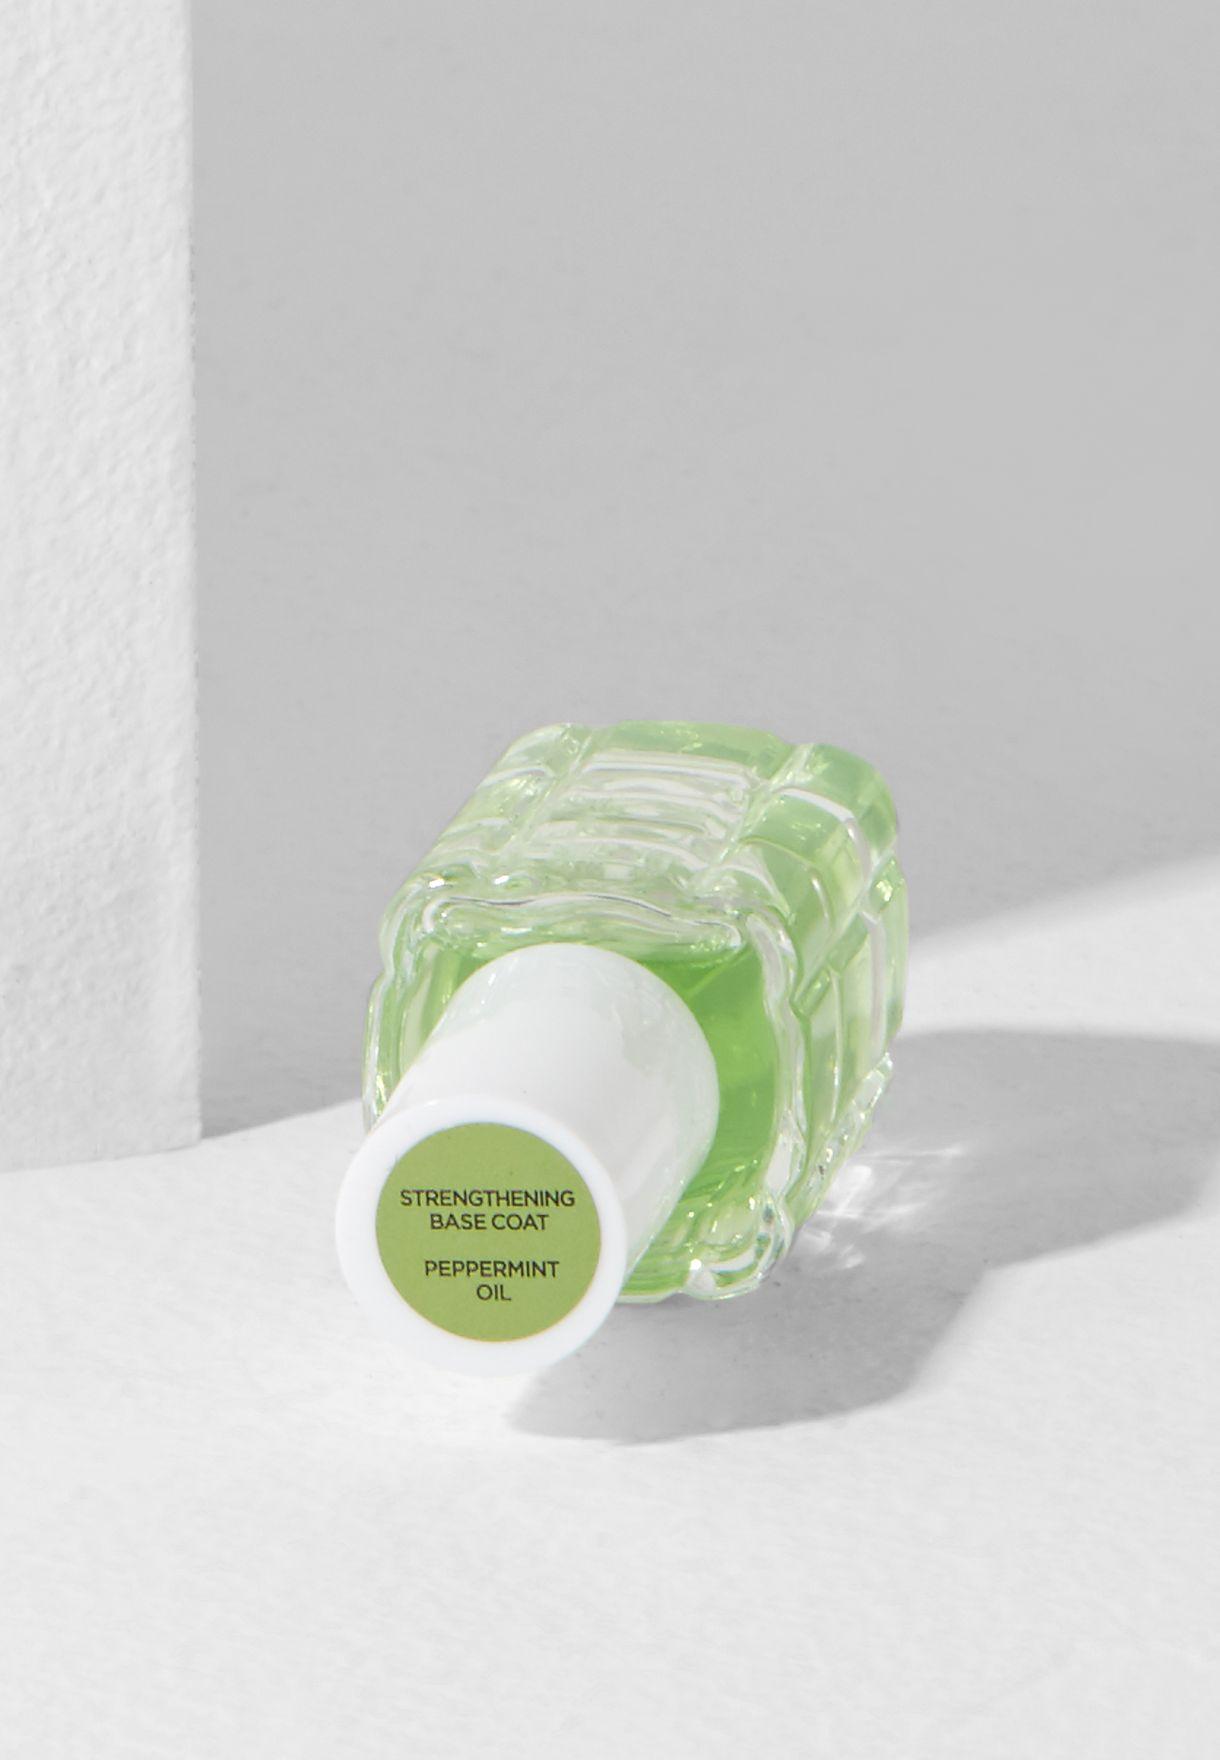 La Manicure L'Huile Nail Polish Strength Peppermint